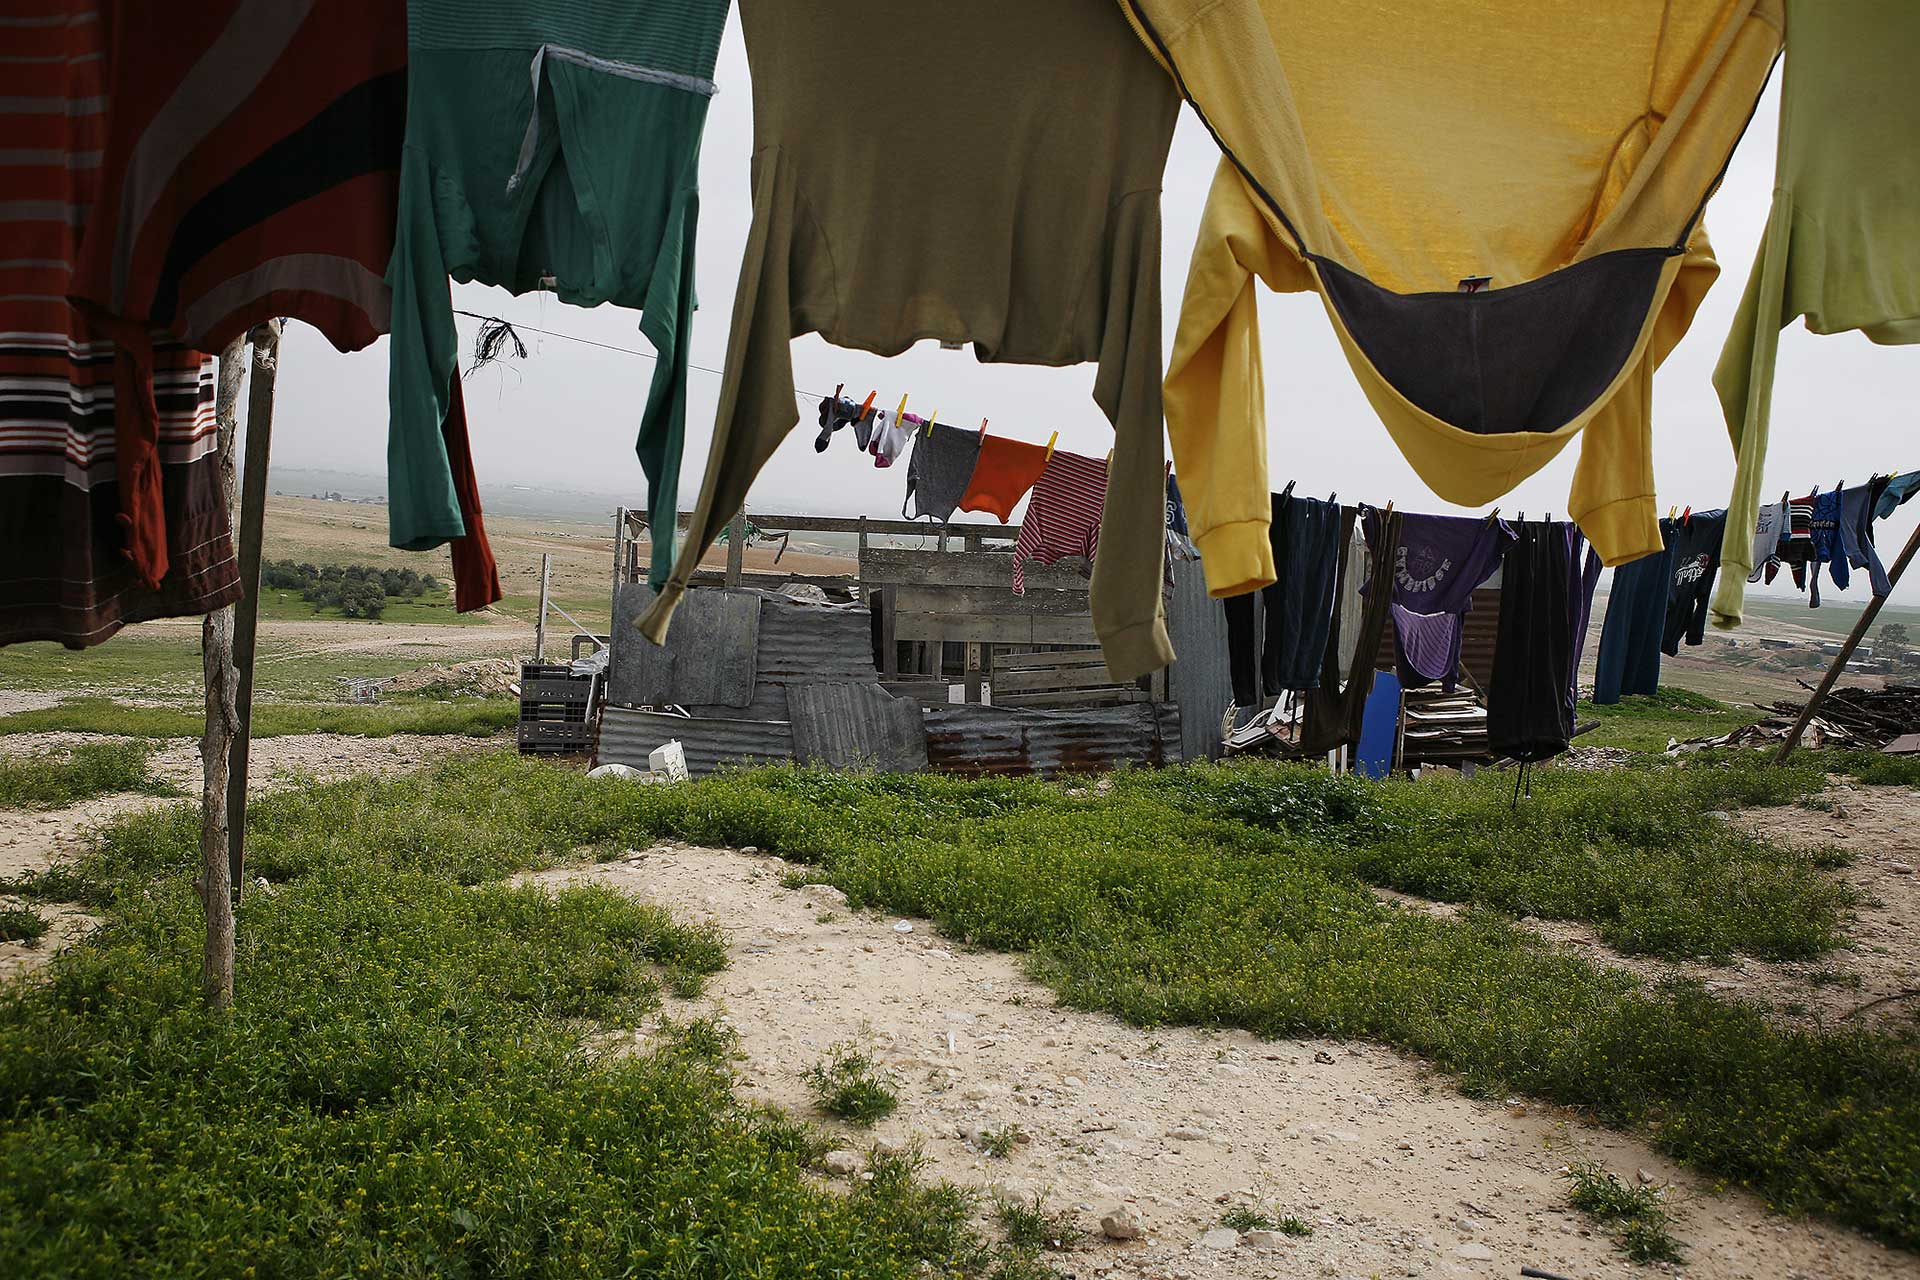 Unrecognized village of Alsira, Israel 2014